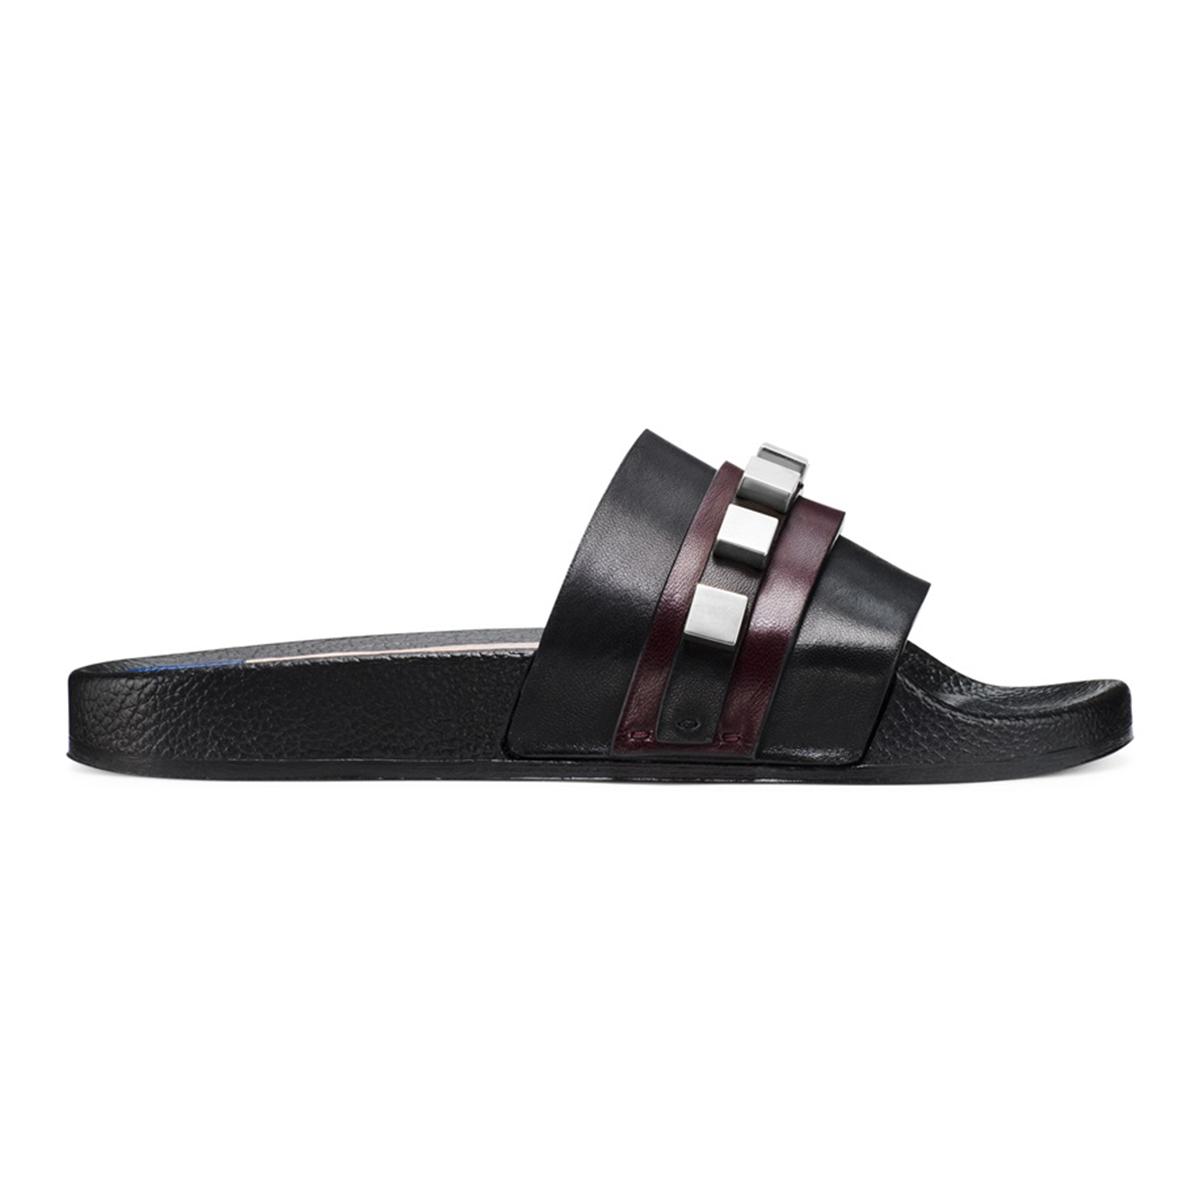 SW sandals side